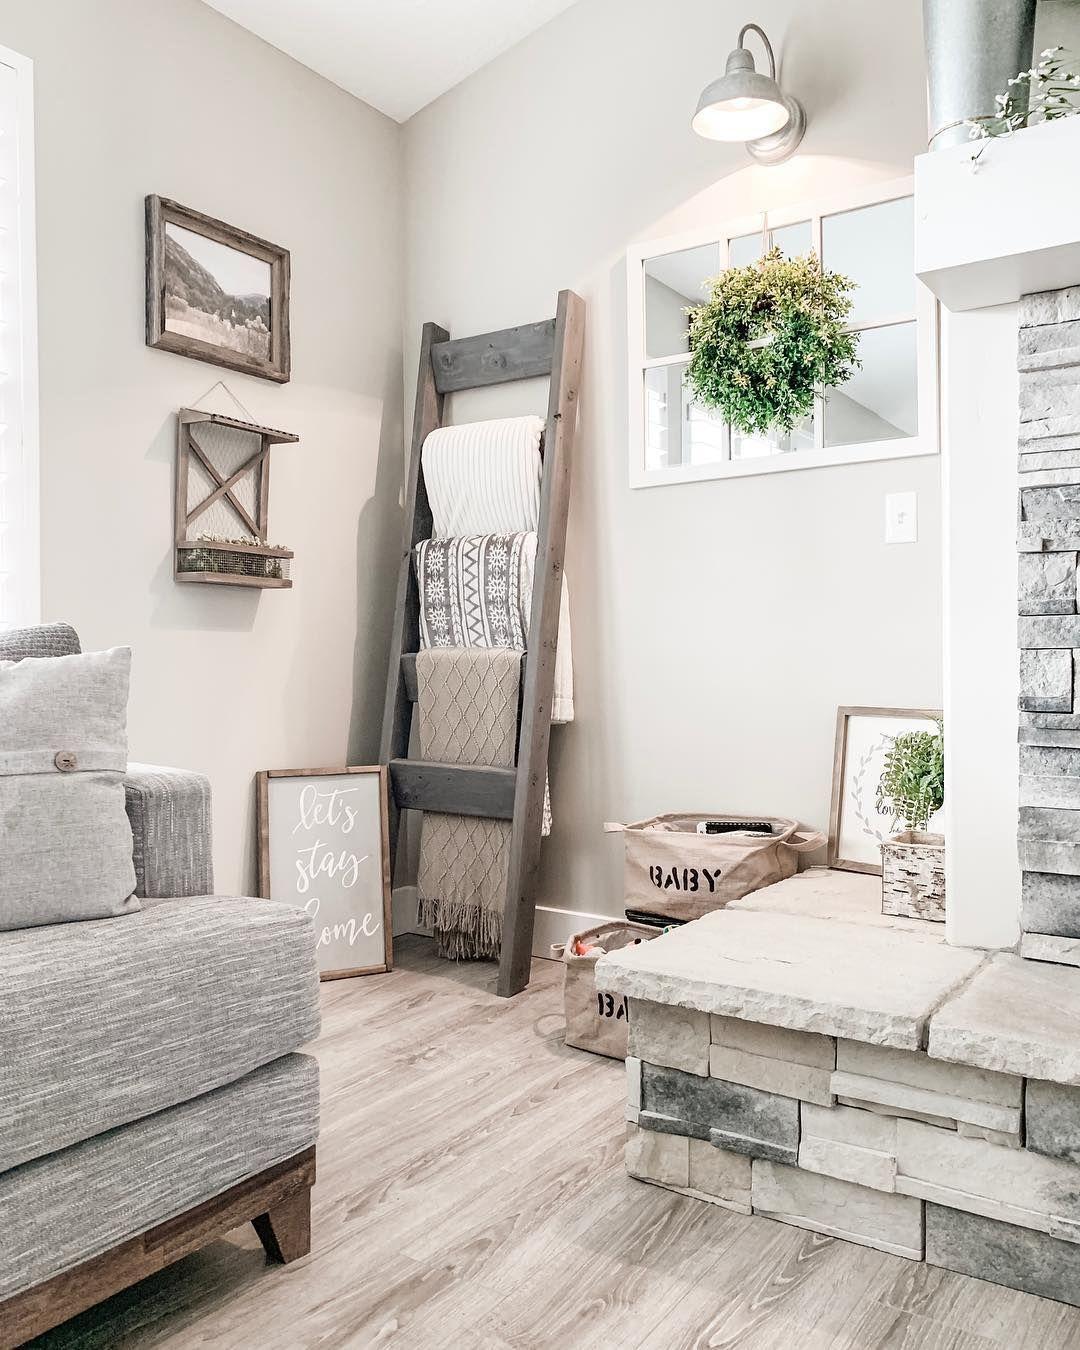 Daily Deals On Vintage Rustic Farmhouse Decor Farm House Living Room Corner Decor Warm Home Decor